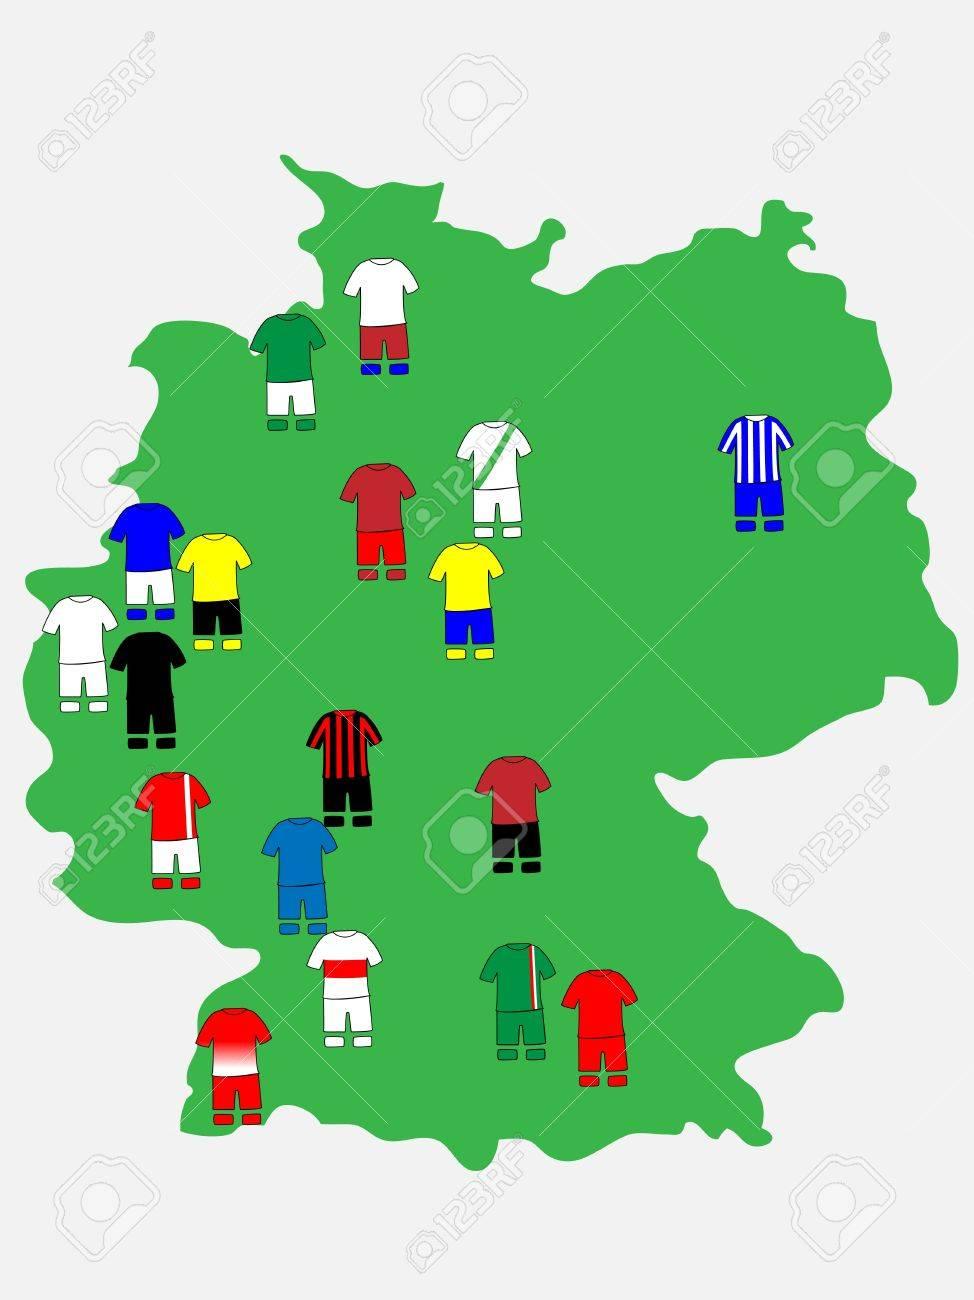 German League Clubs Map 2013-14 Bundesliga Stock Vector - 21214985